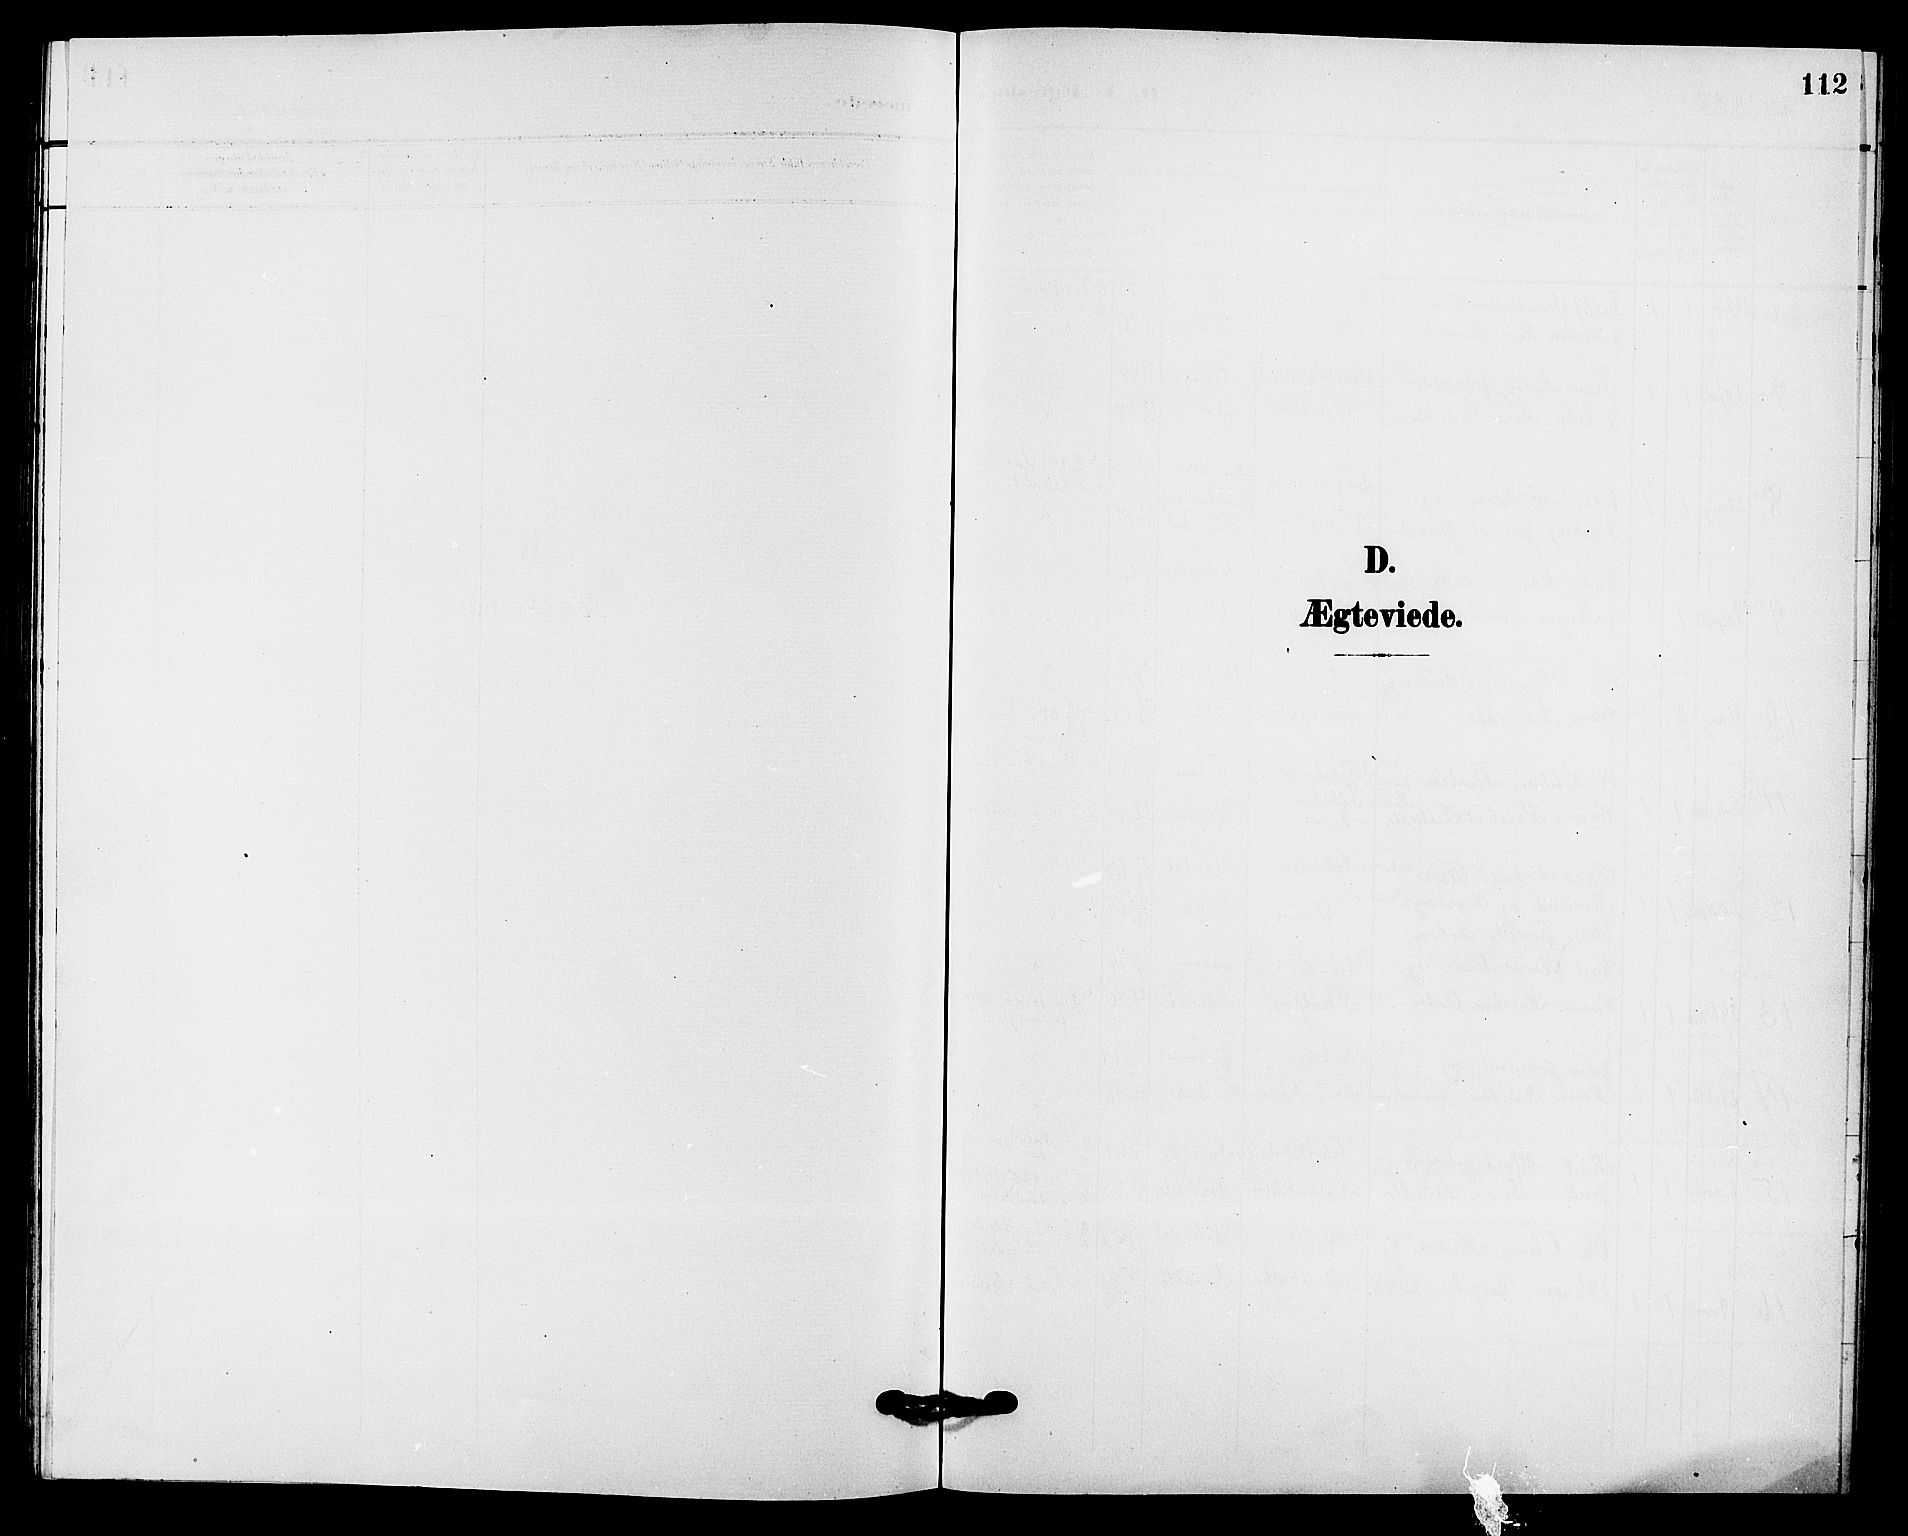 SAKO, Solum kirkebøker, G/Gb/L0004: Klokkerbok nr. II 4, 1898-1905, s. 112